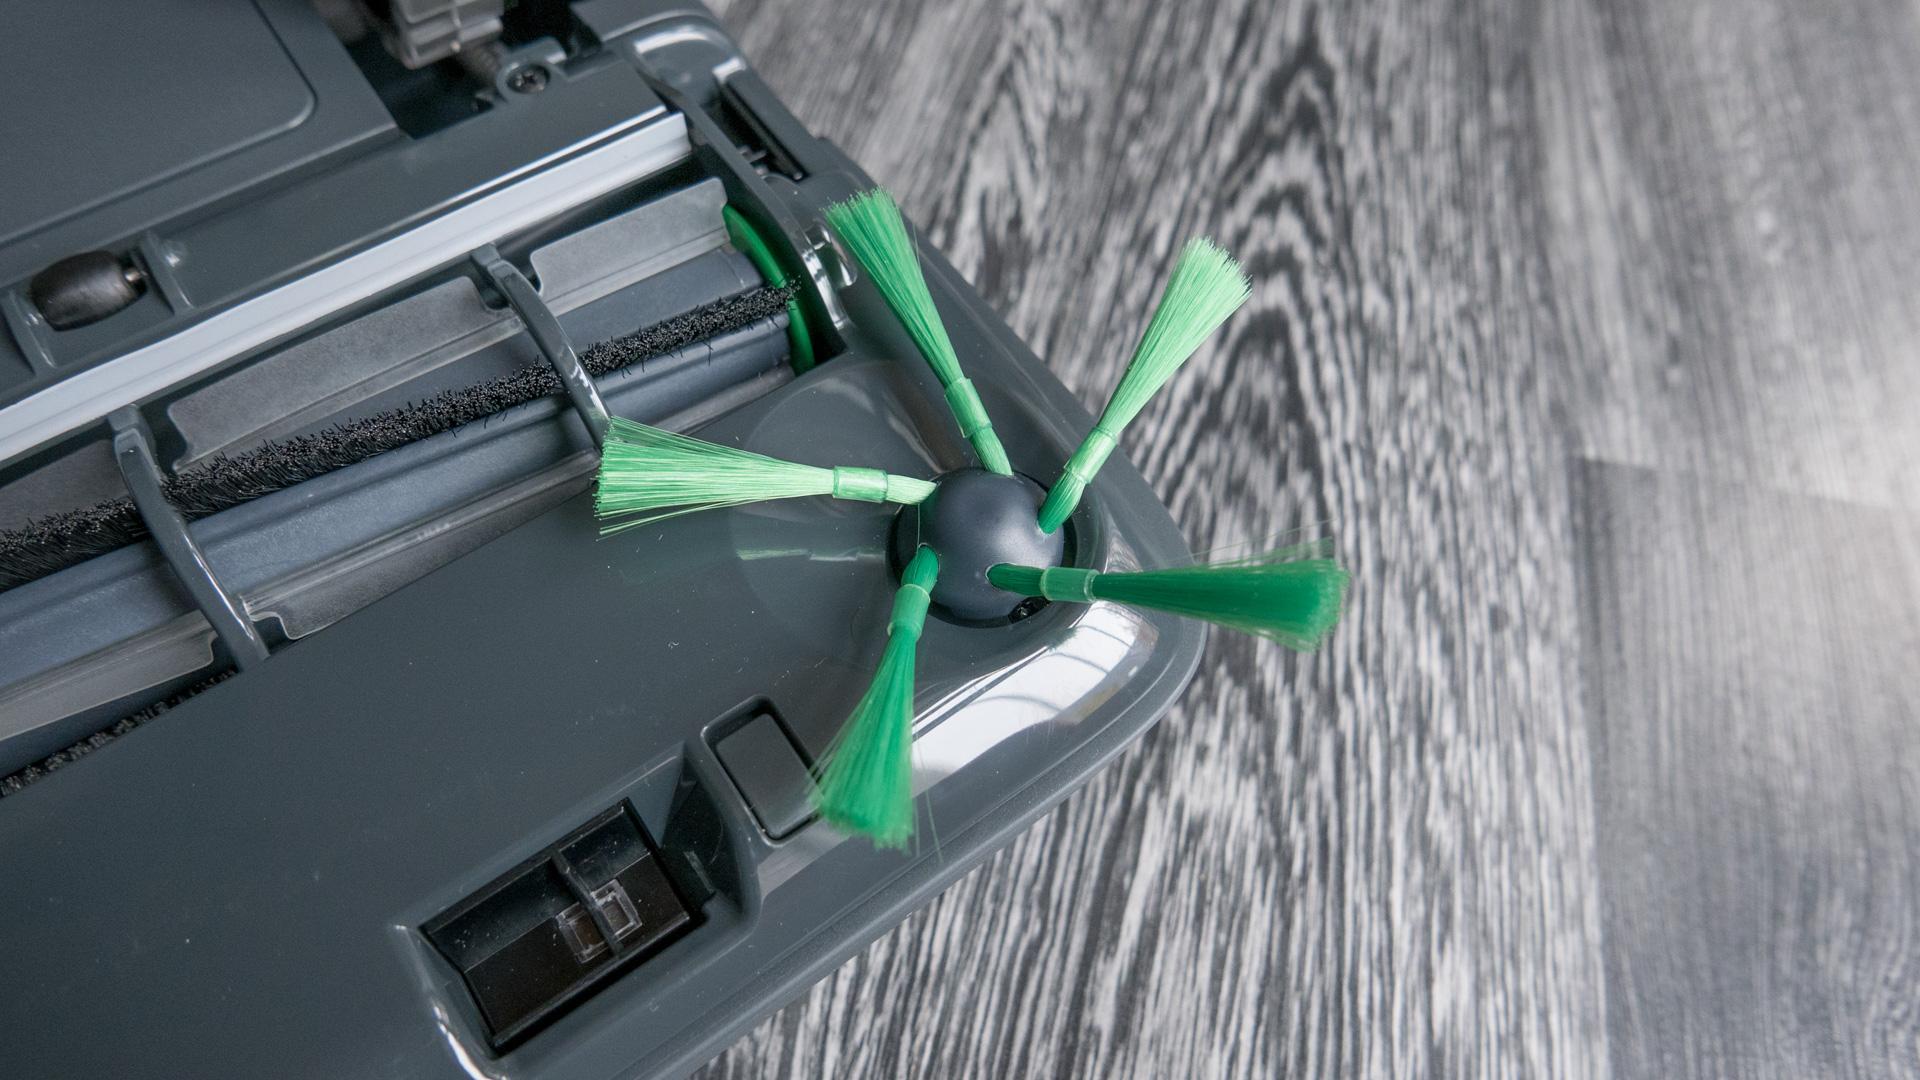 Vorwerk-VR300-Details-22